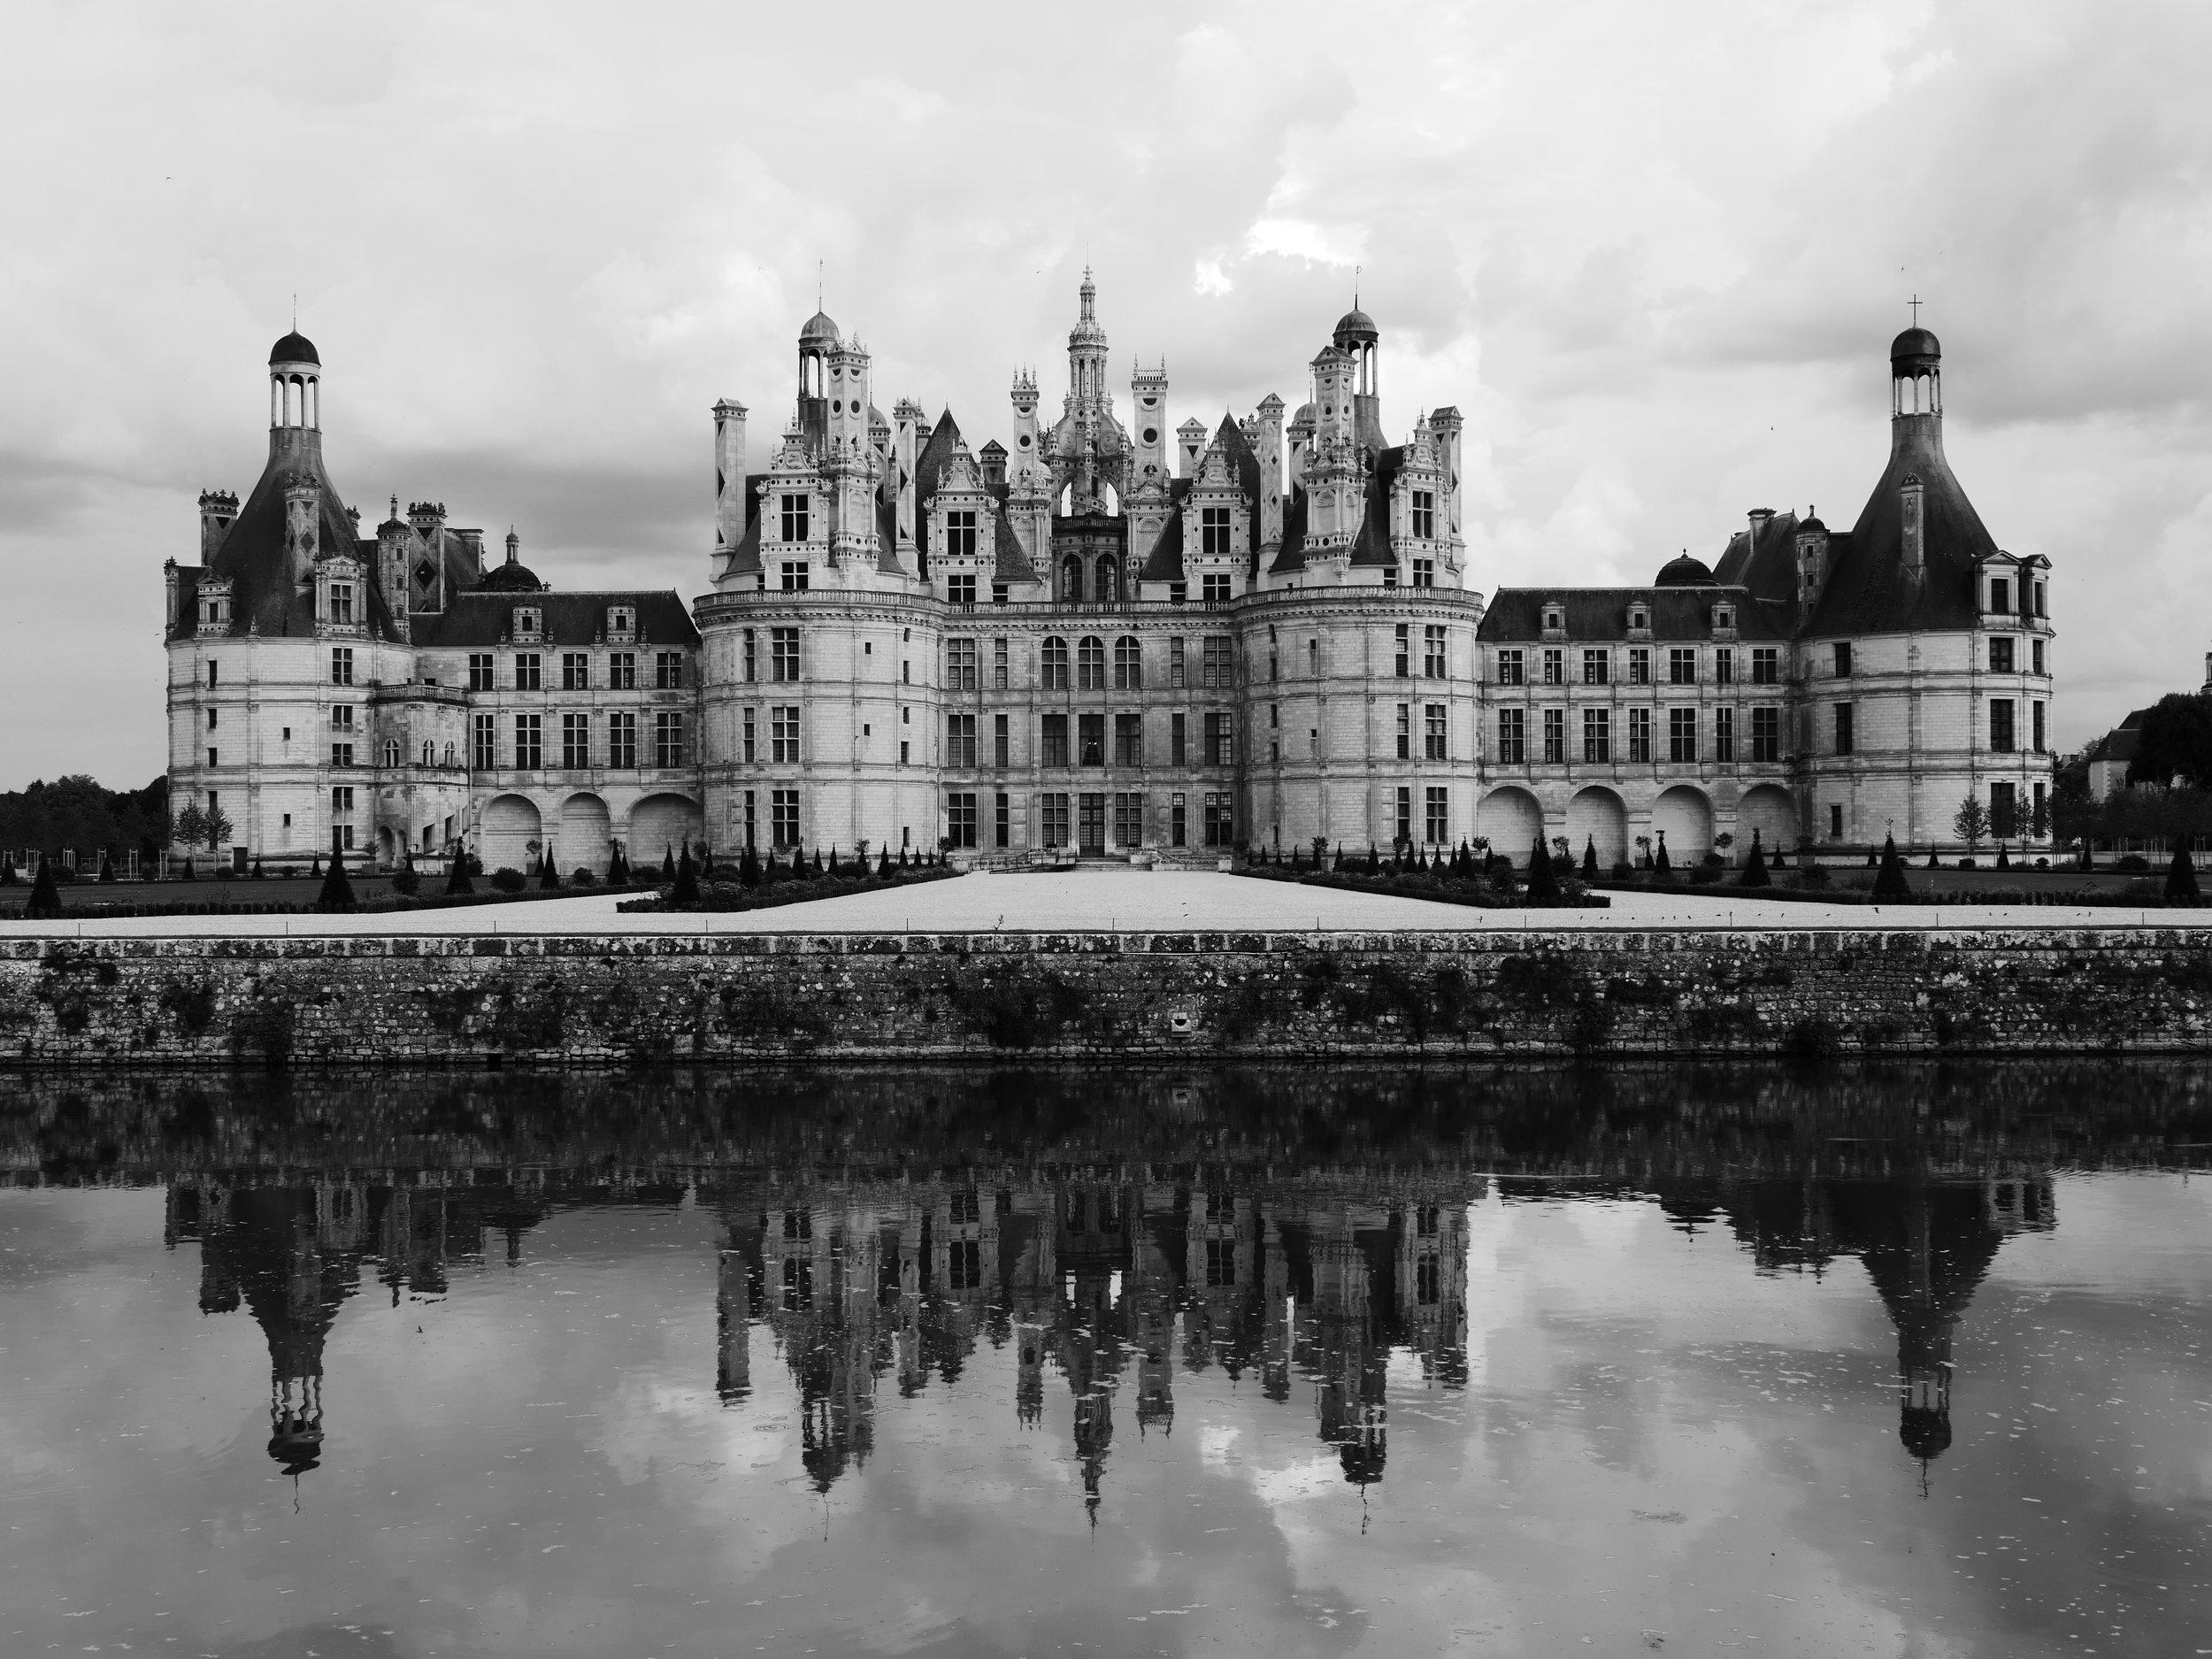 F_DBenstock_Chateau de Chambord.JPG